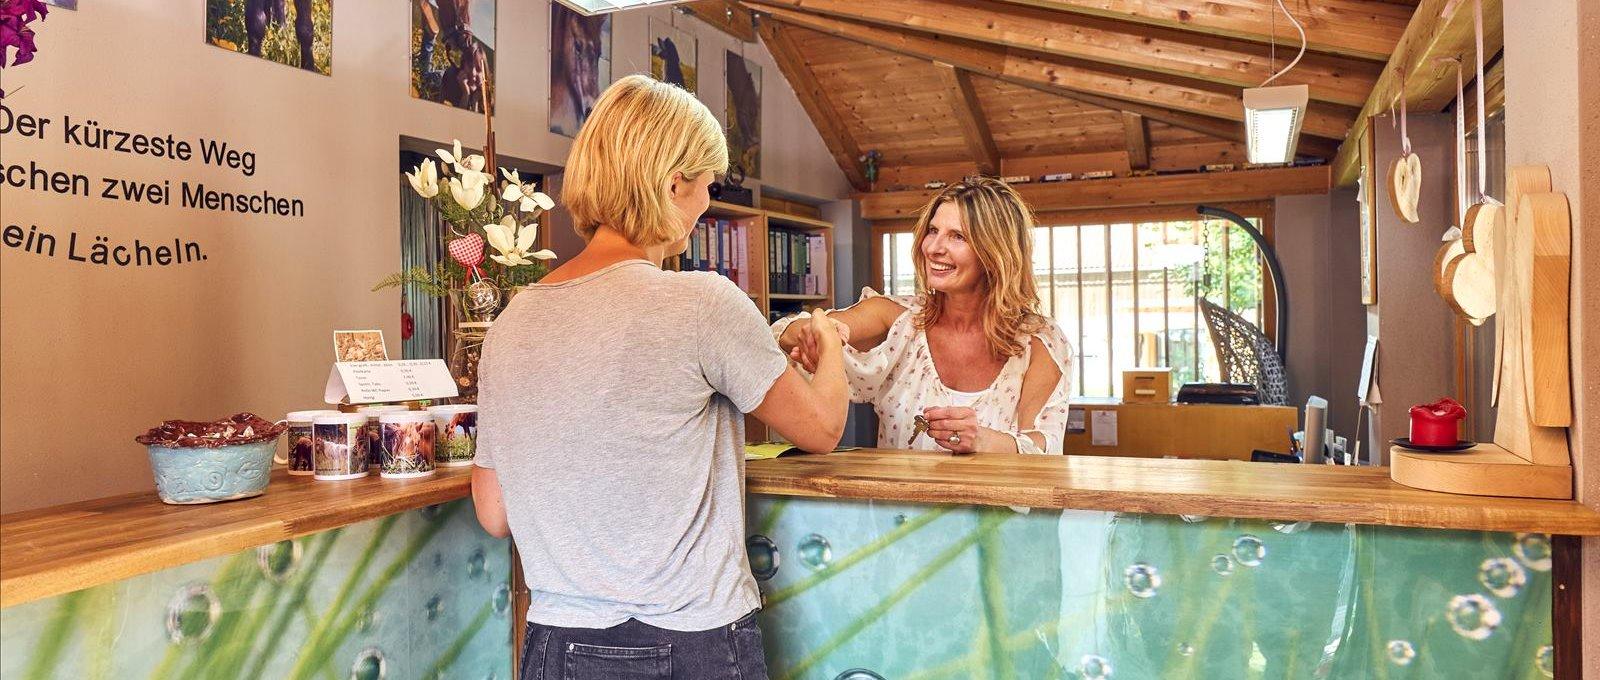 ponyferienhof-panoramabilder-wellnessurlaub-niederbayern-massage-kosmetik